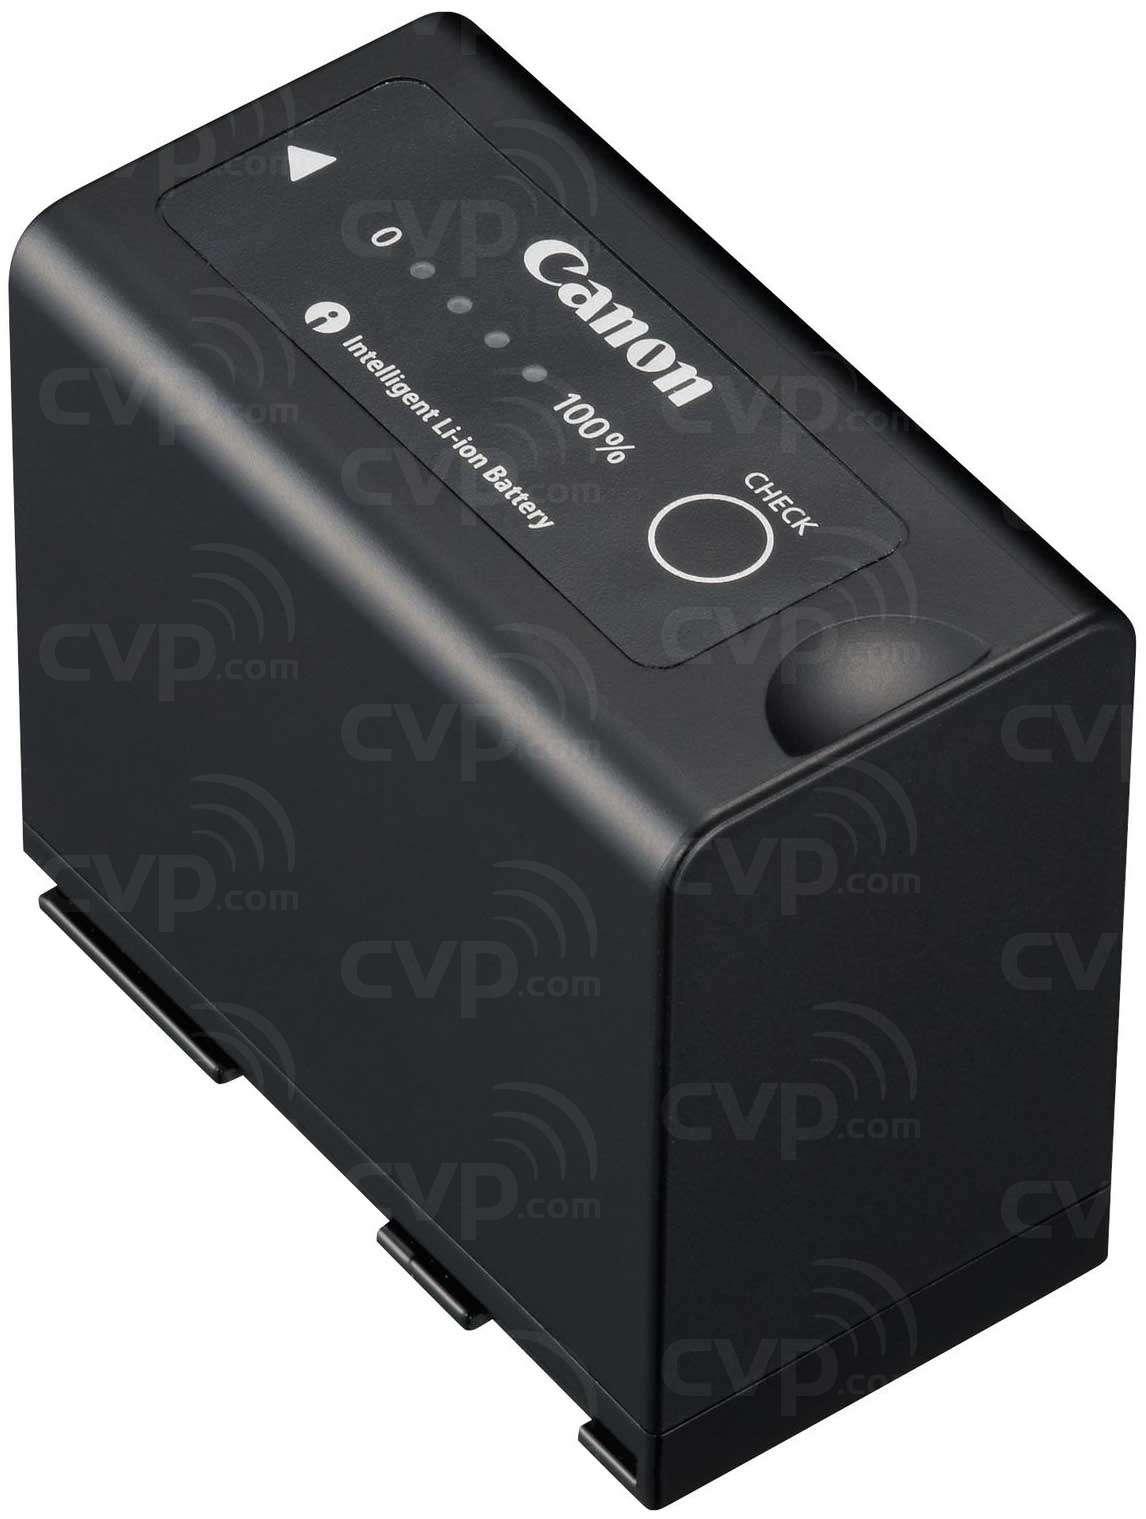 Canon BP-975 (BP975) High Capacity Battery for XF300 / XF305